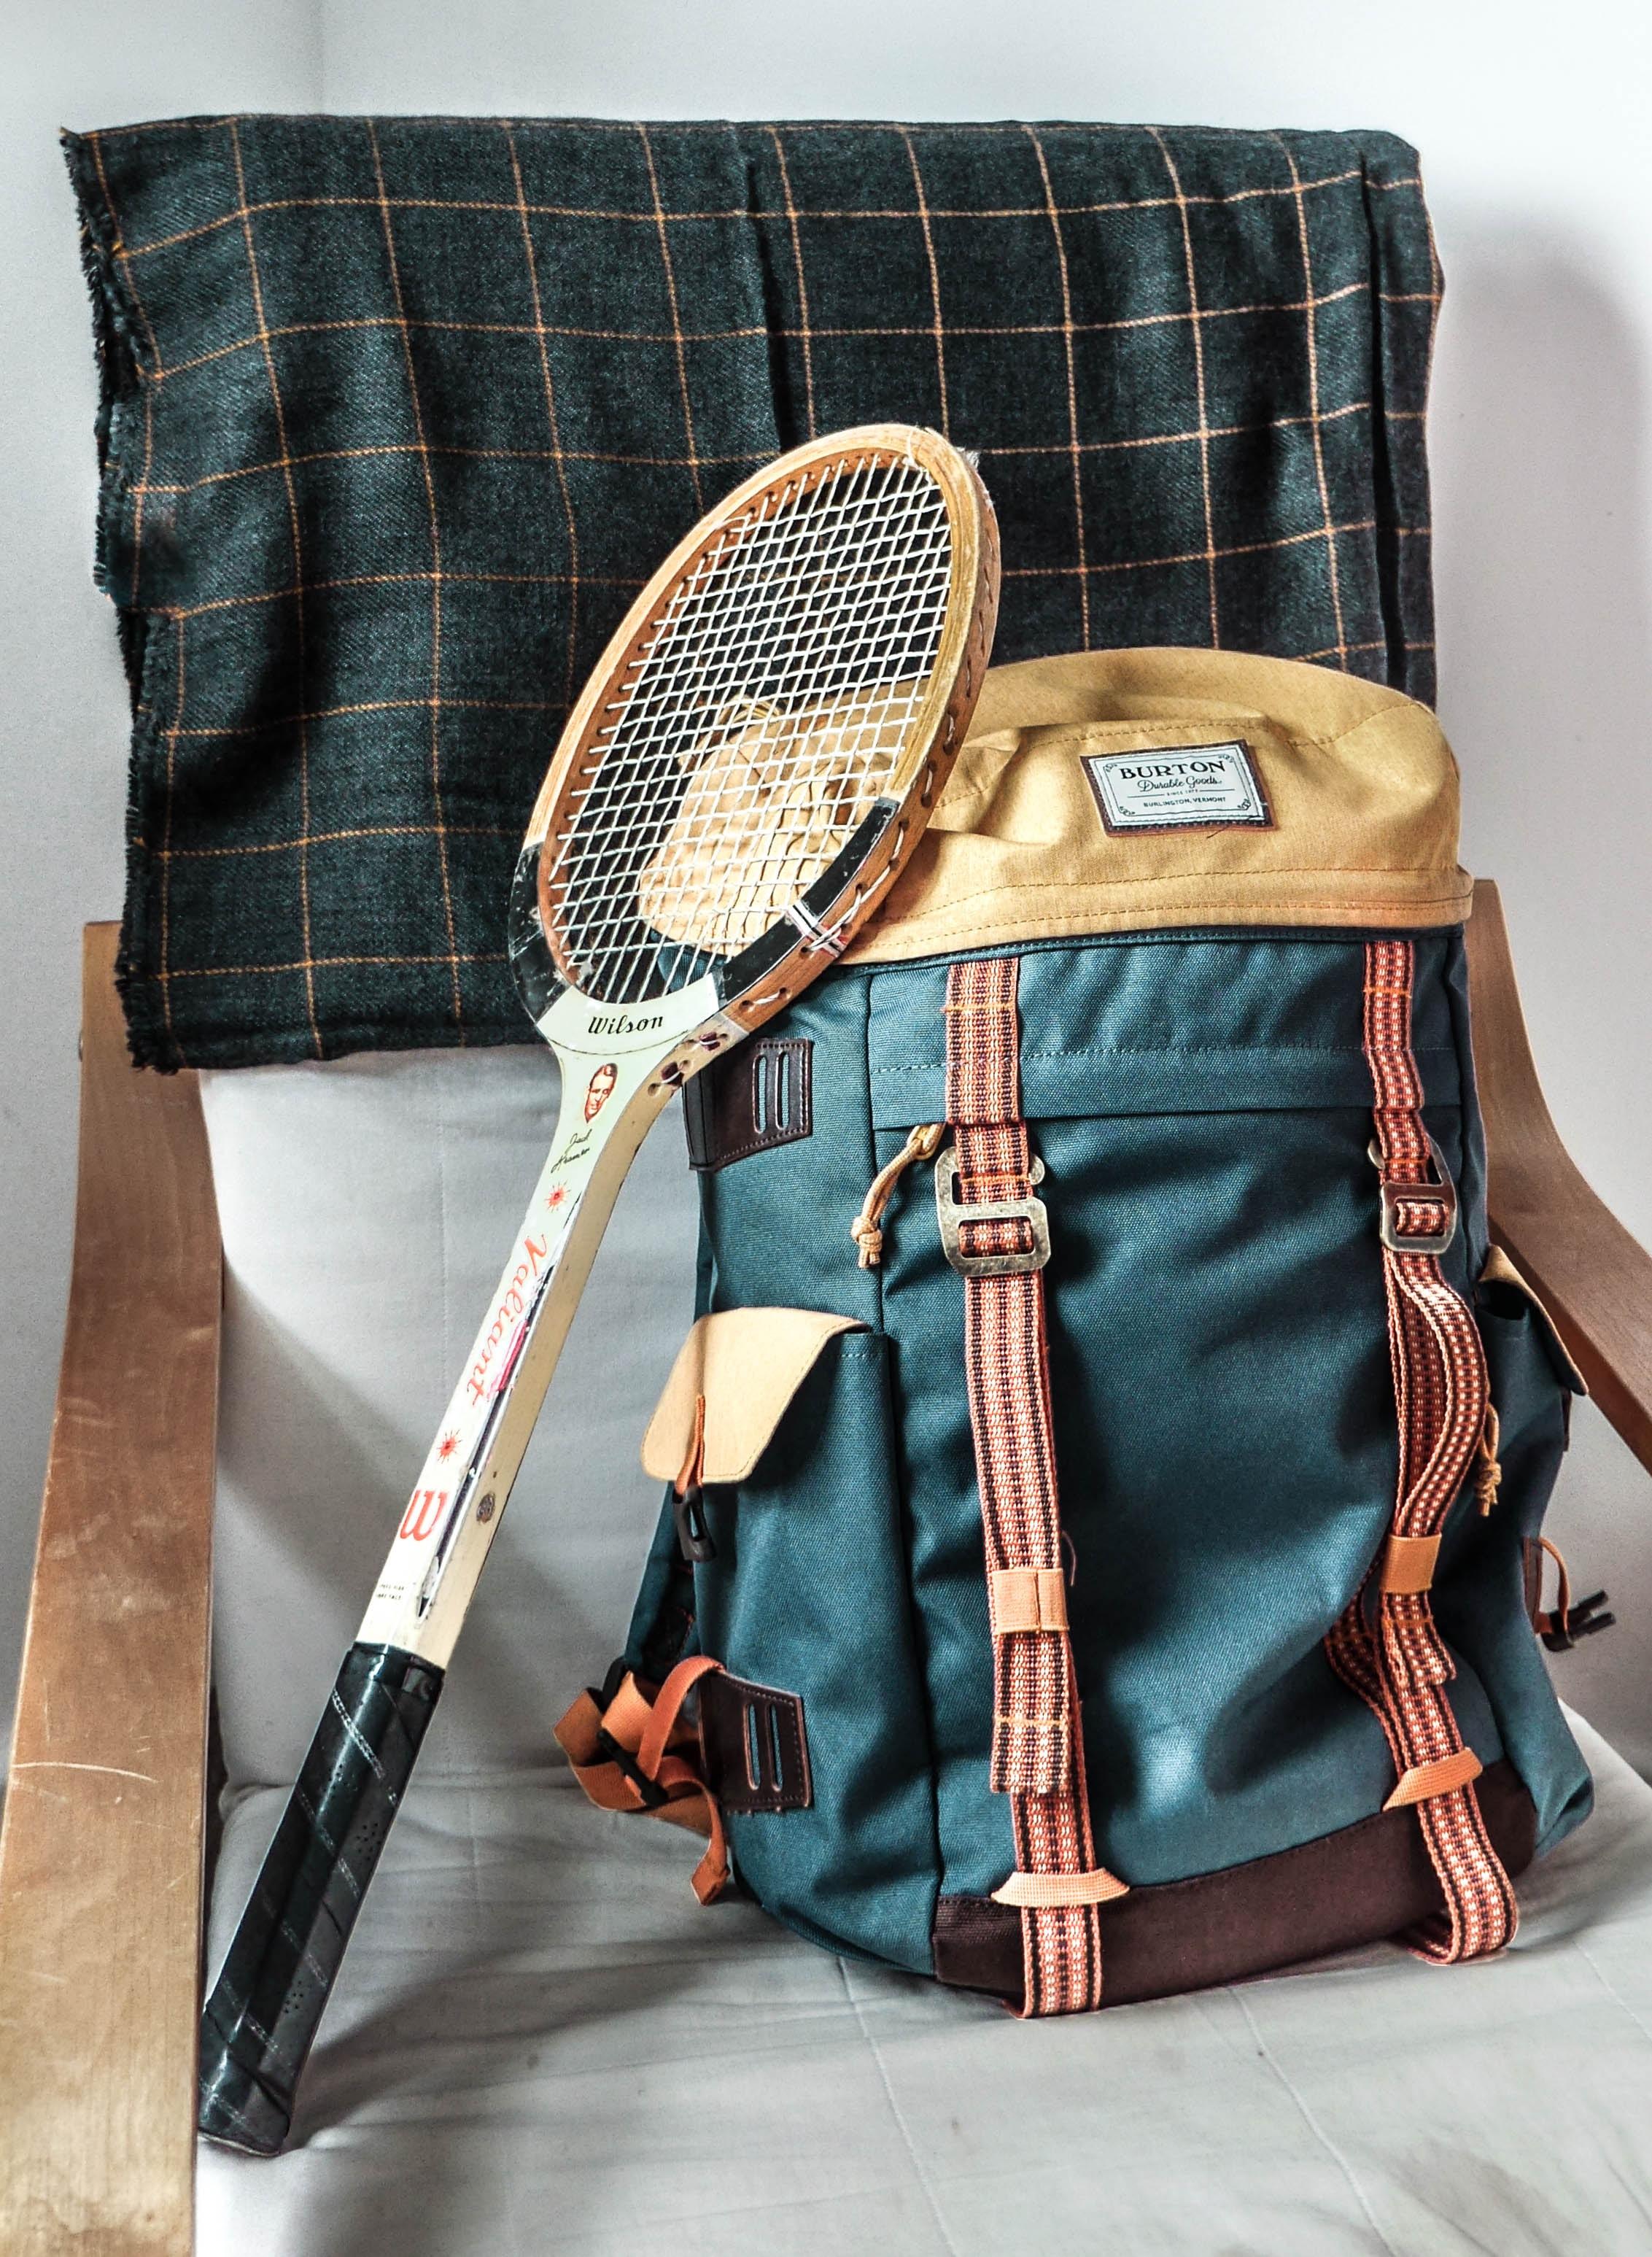 vintage brown tennis racket and green hiking backpack